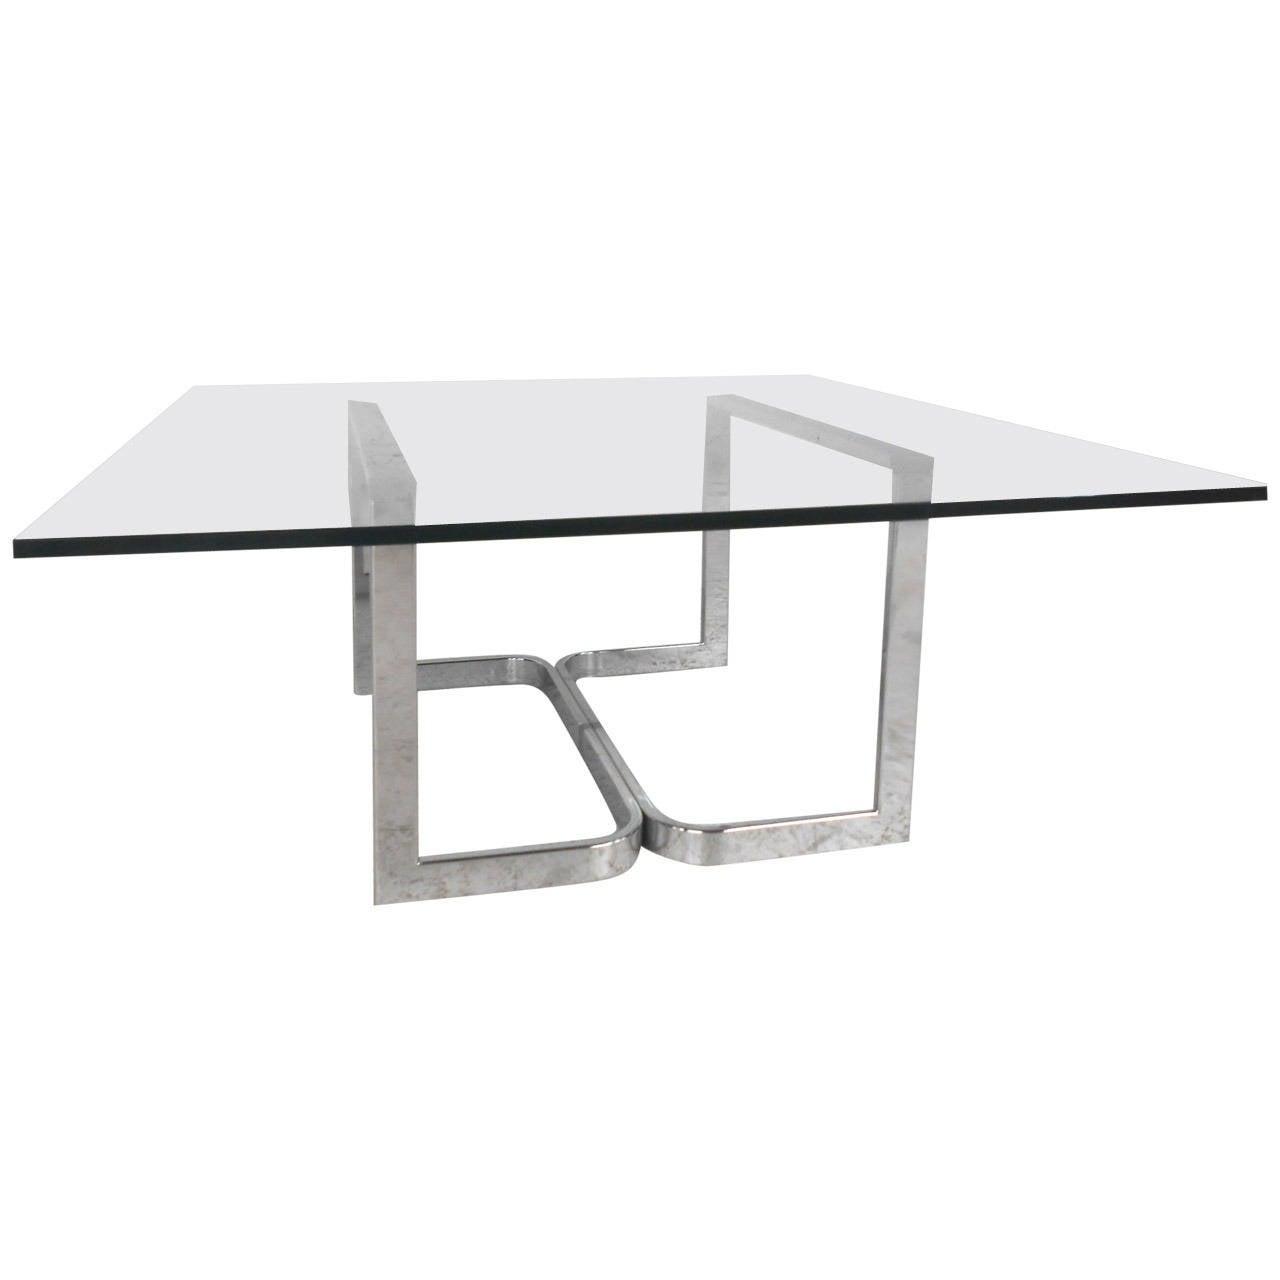 Mid-Century Modern Milo Baughman Style Chrome and Glass Coffee Table